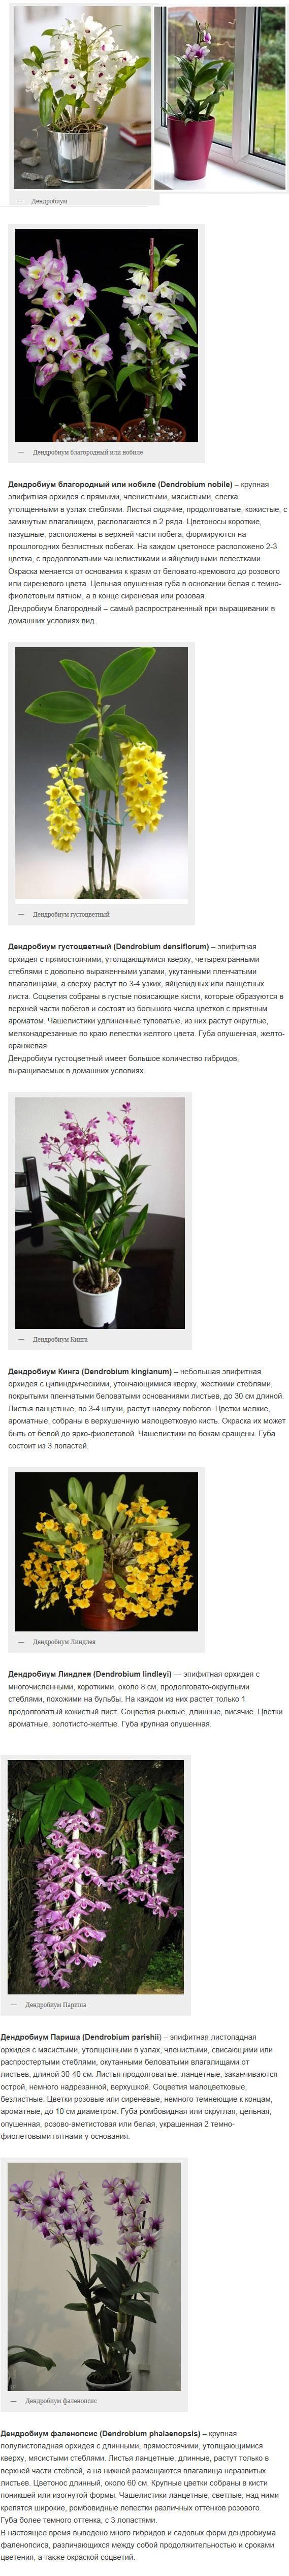 Орхидея бамбуковая уход в домашних условиях